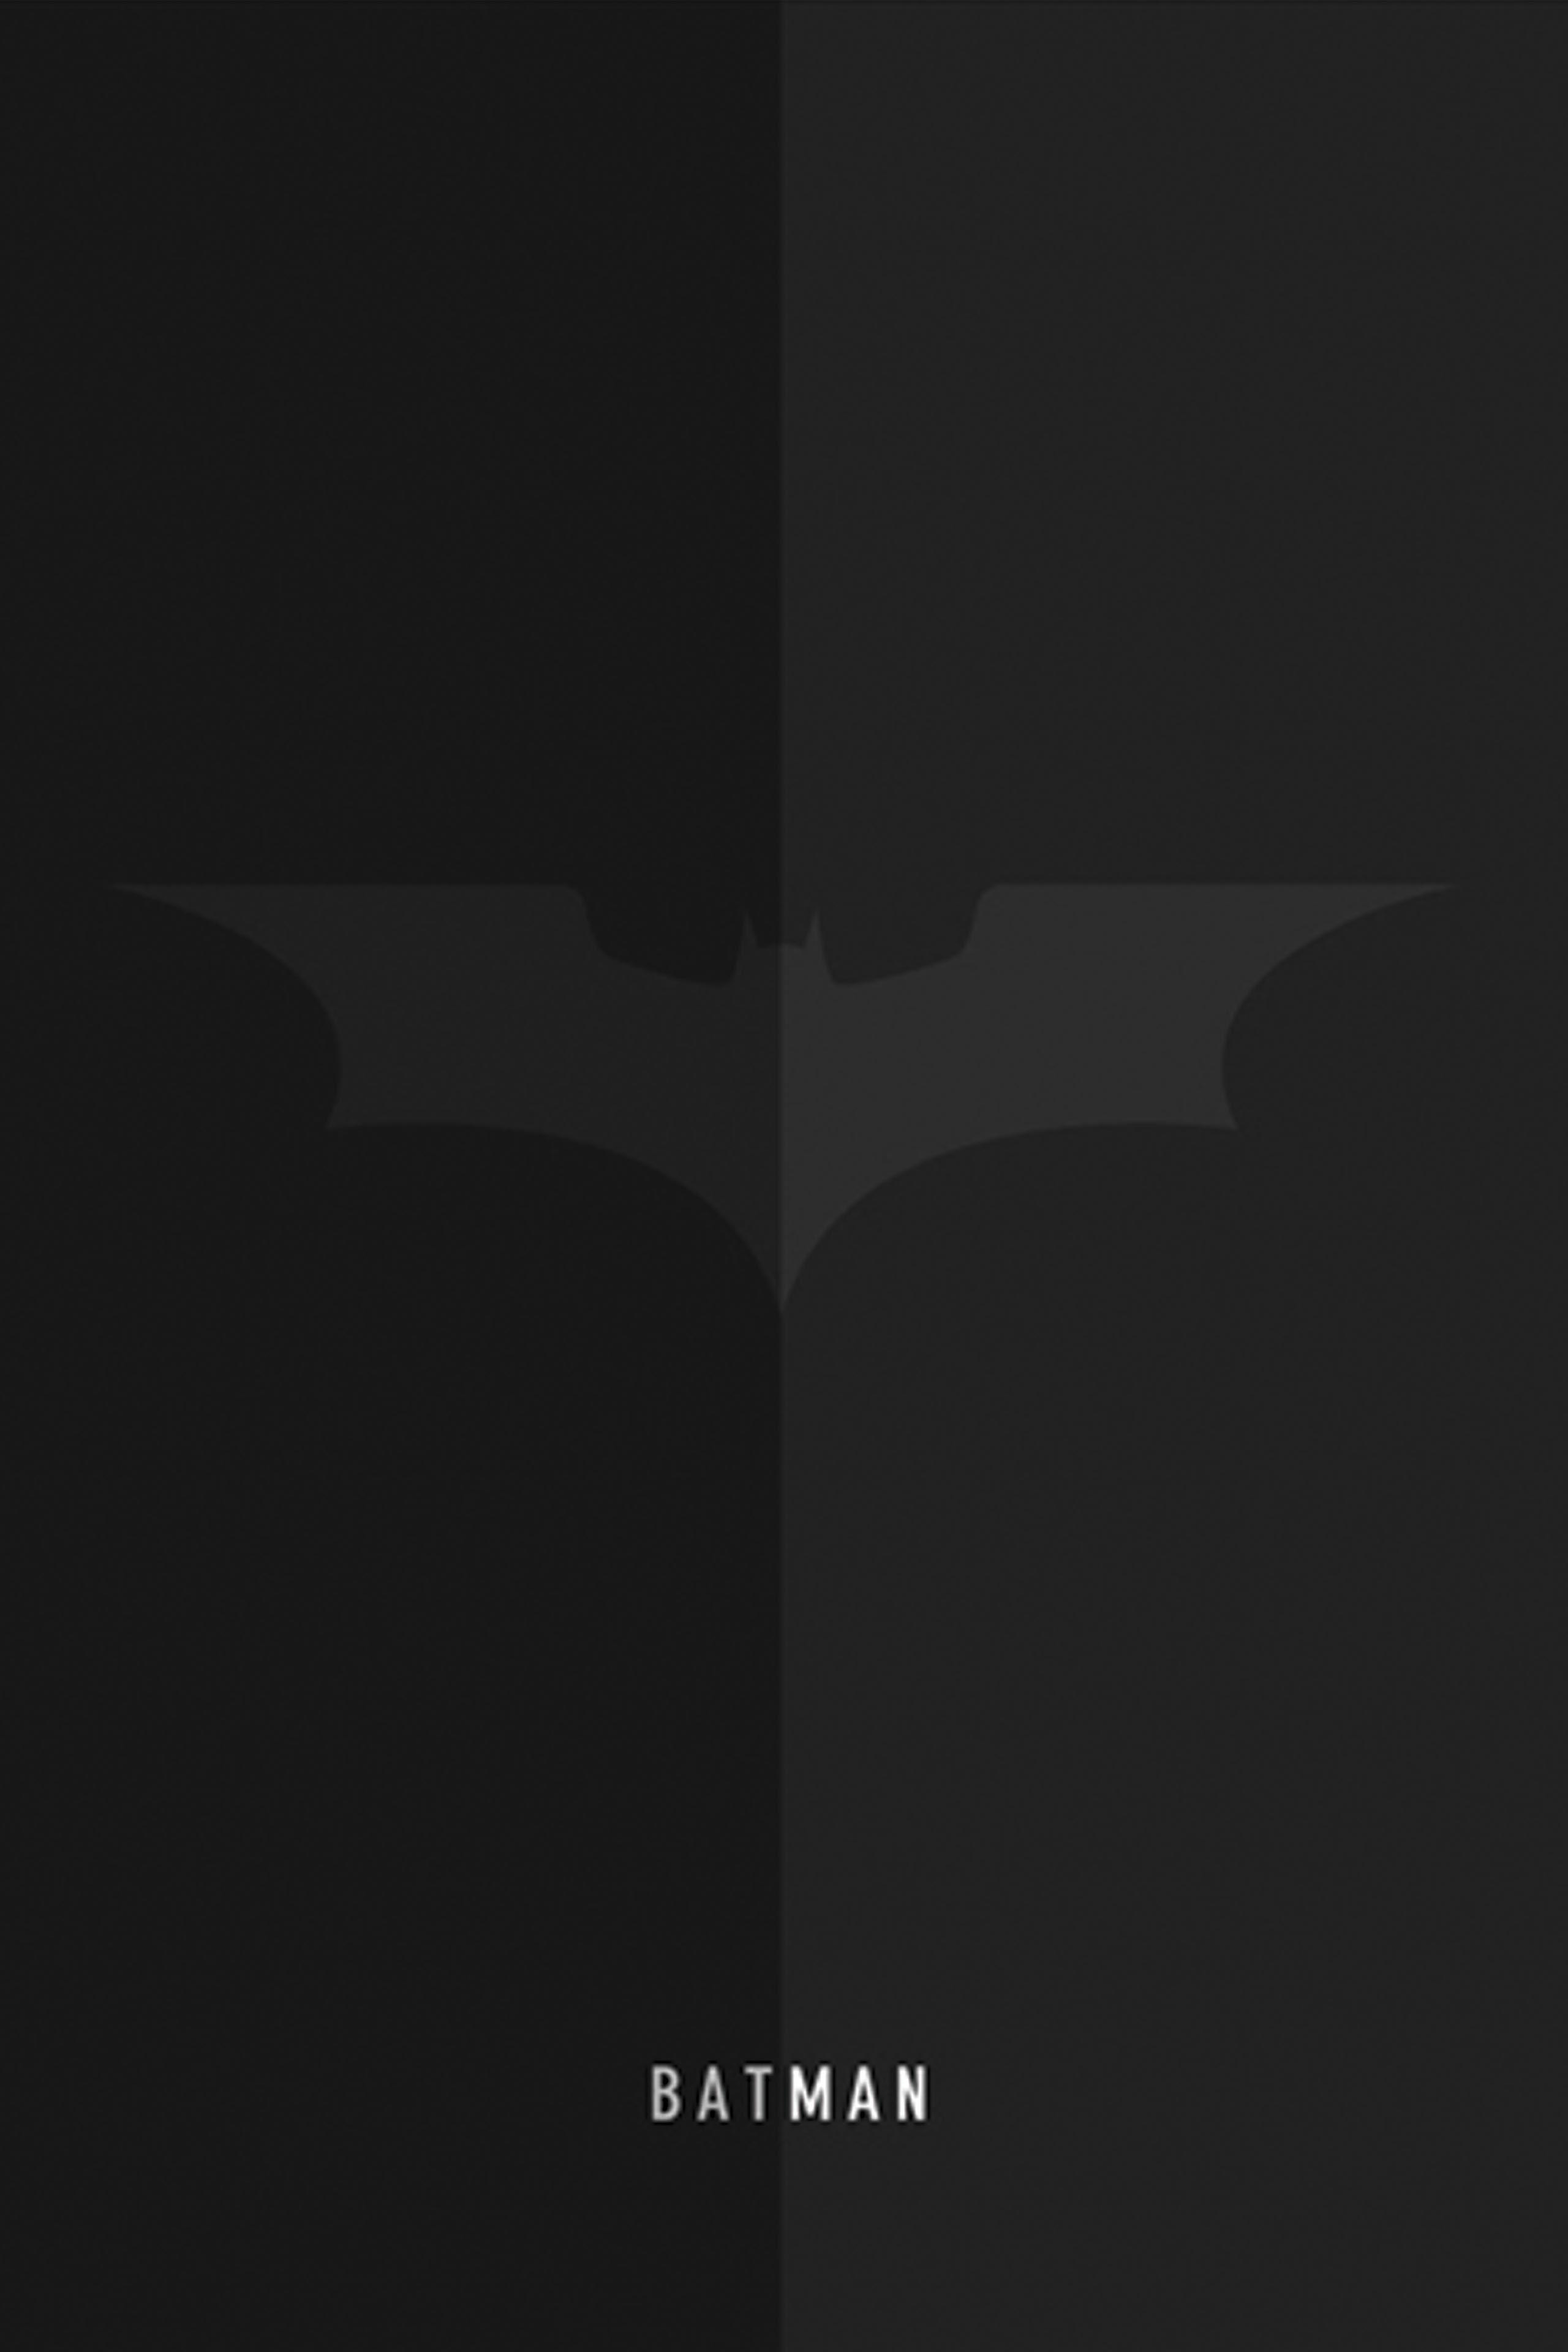 Batman Mobile Wallpaper Minimalist 2560x3840 Batman Wallpaper Batman Wallpaper Iphone Mobile Wallpaper